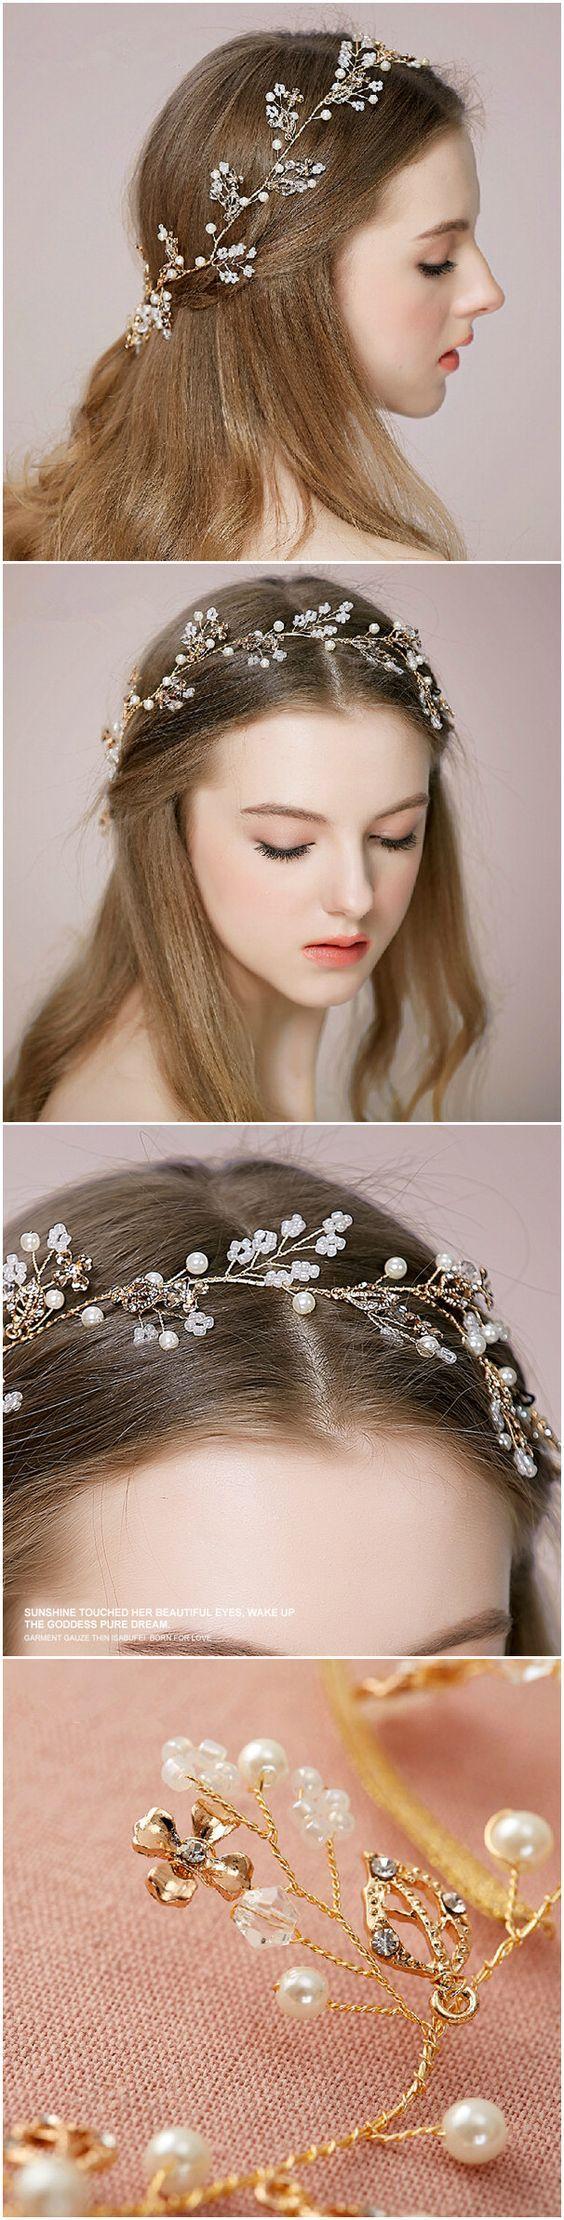 2016 trending bohemian themed bridal headbands wedding accessories: